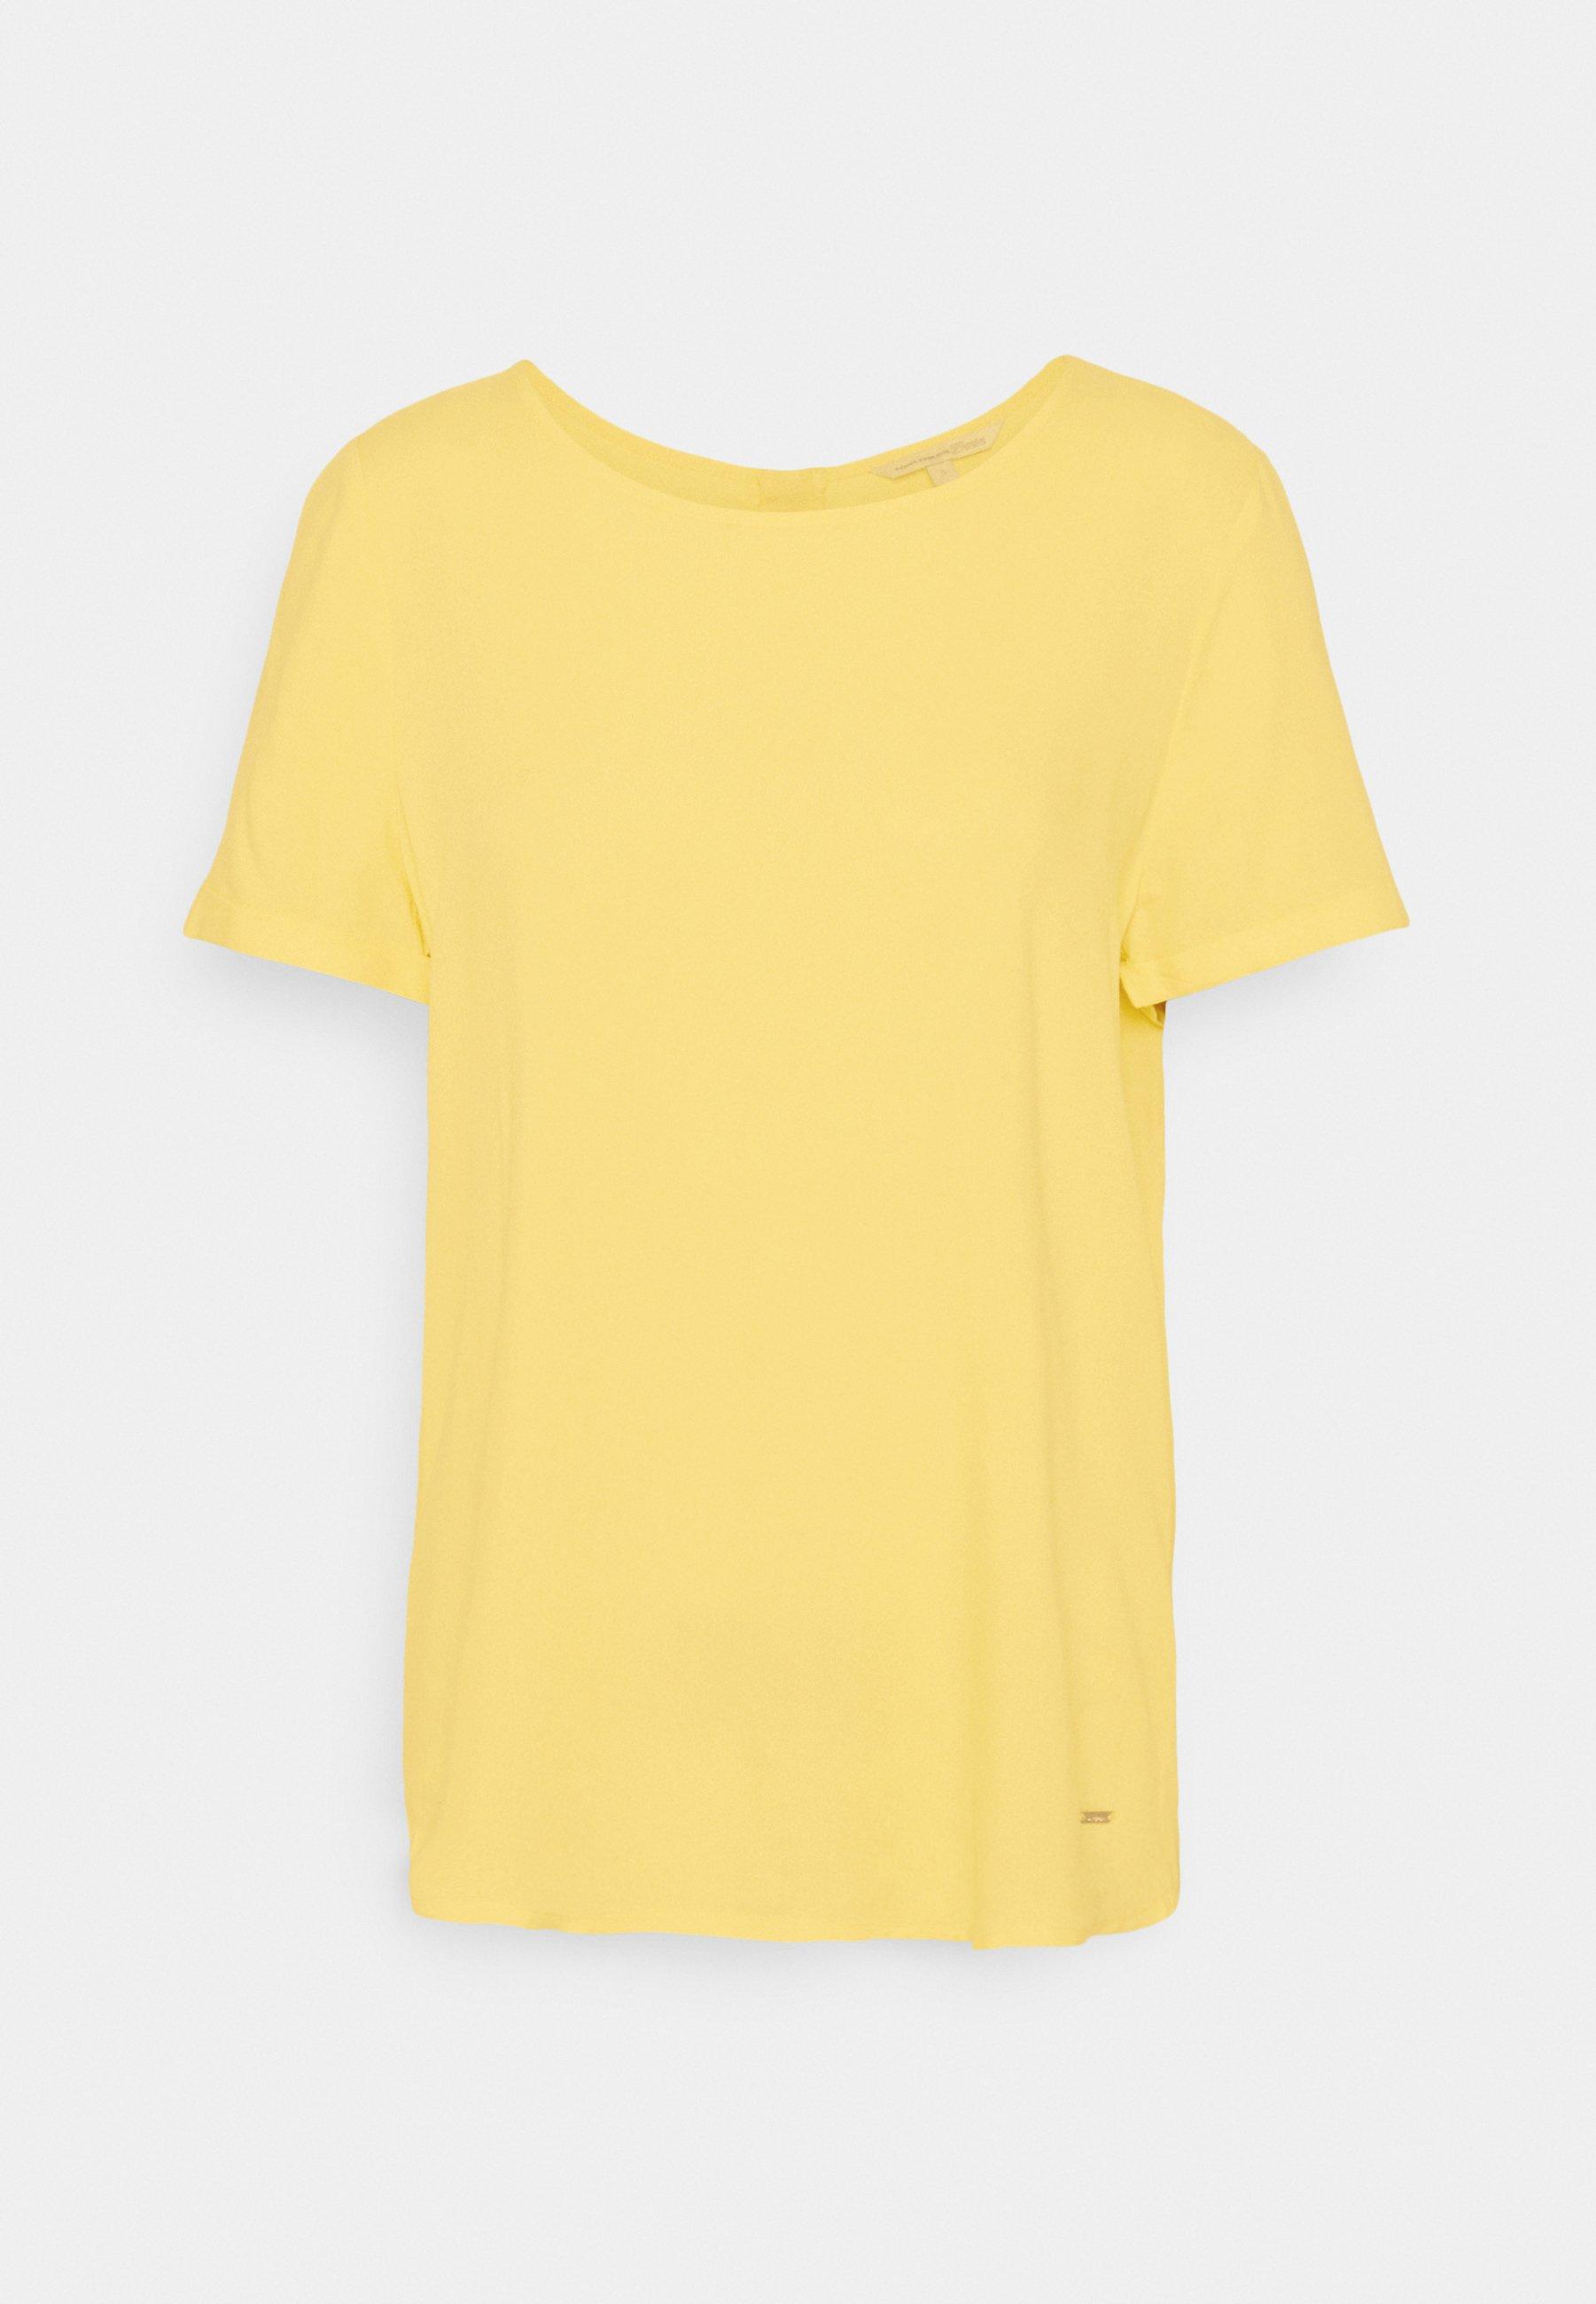 Femme FEMININE WITH ZIPPER - T-shirt imprimé